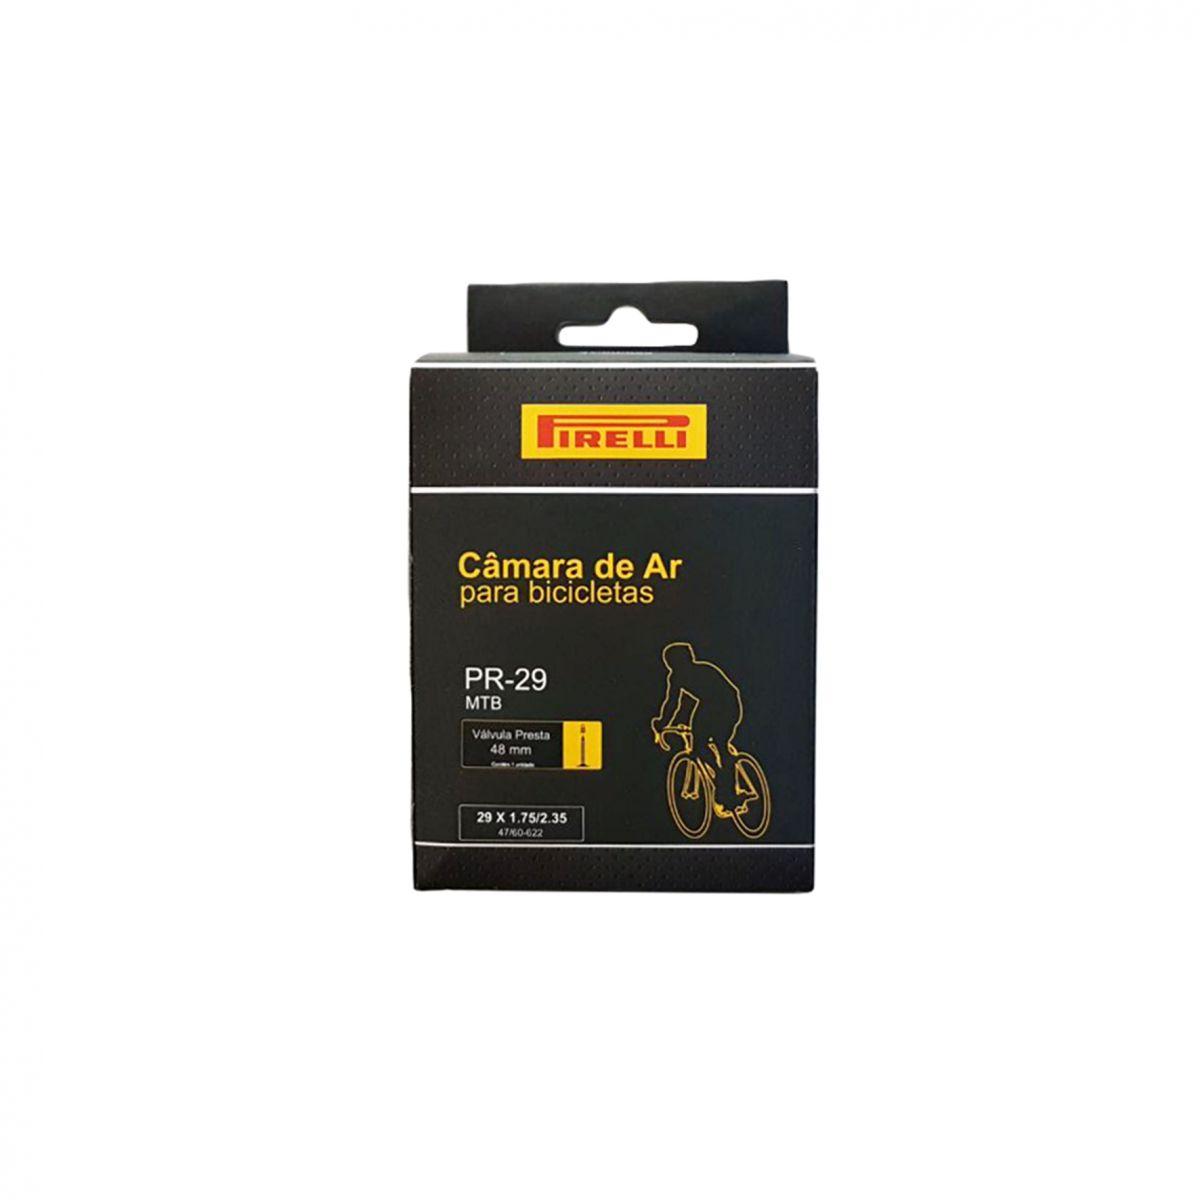 Câmara De Ar para Bicicleta Pirelli Bike MTB Aro 29 Presta Bico Fino 48mm